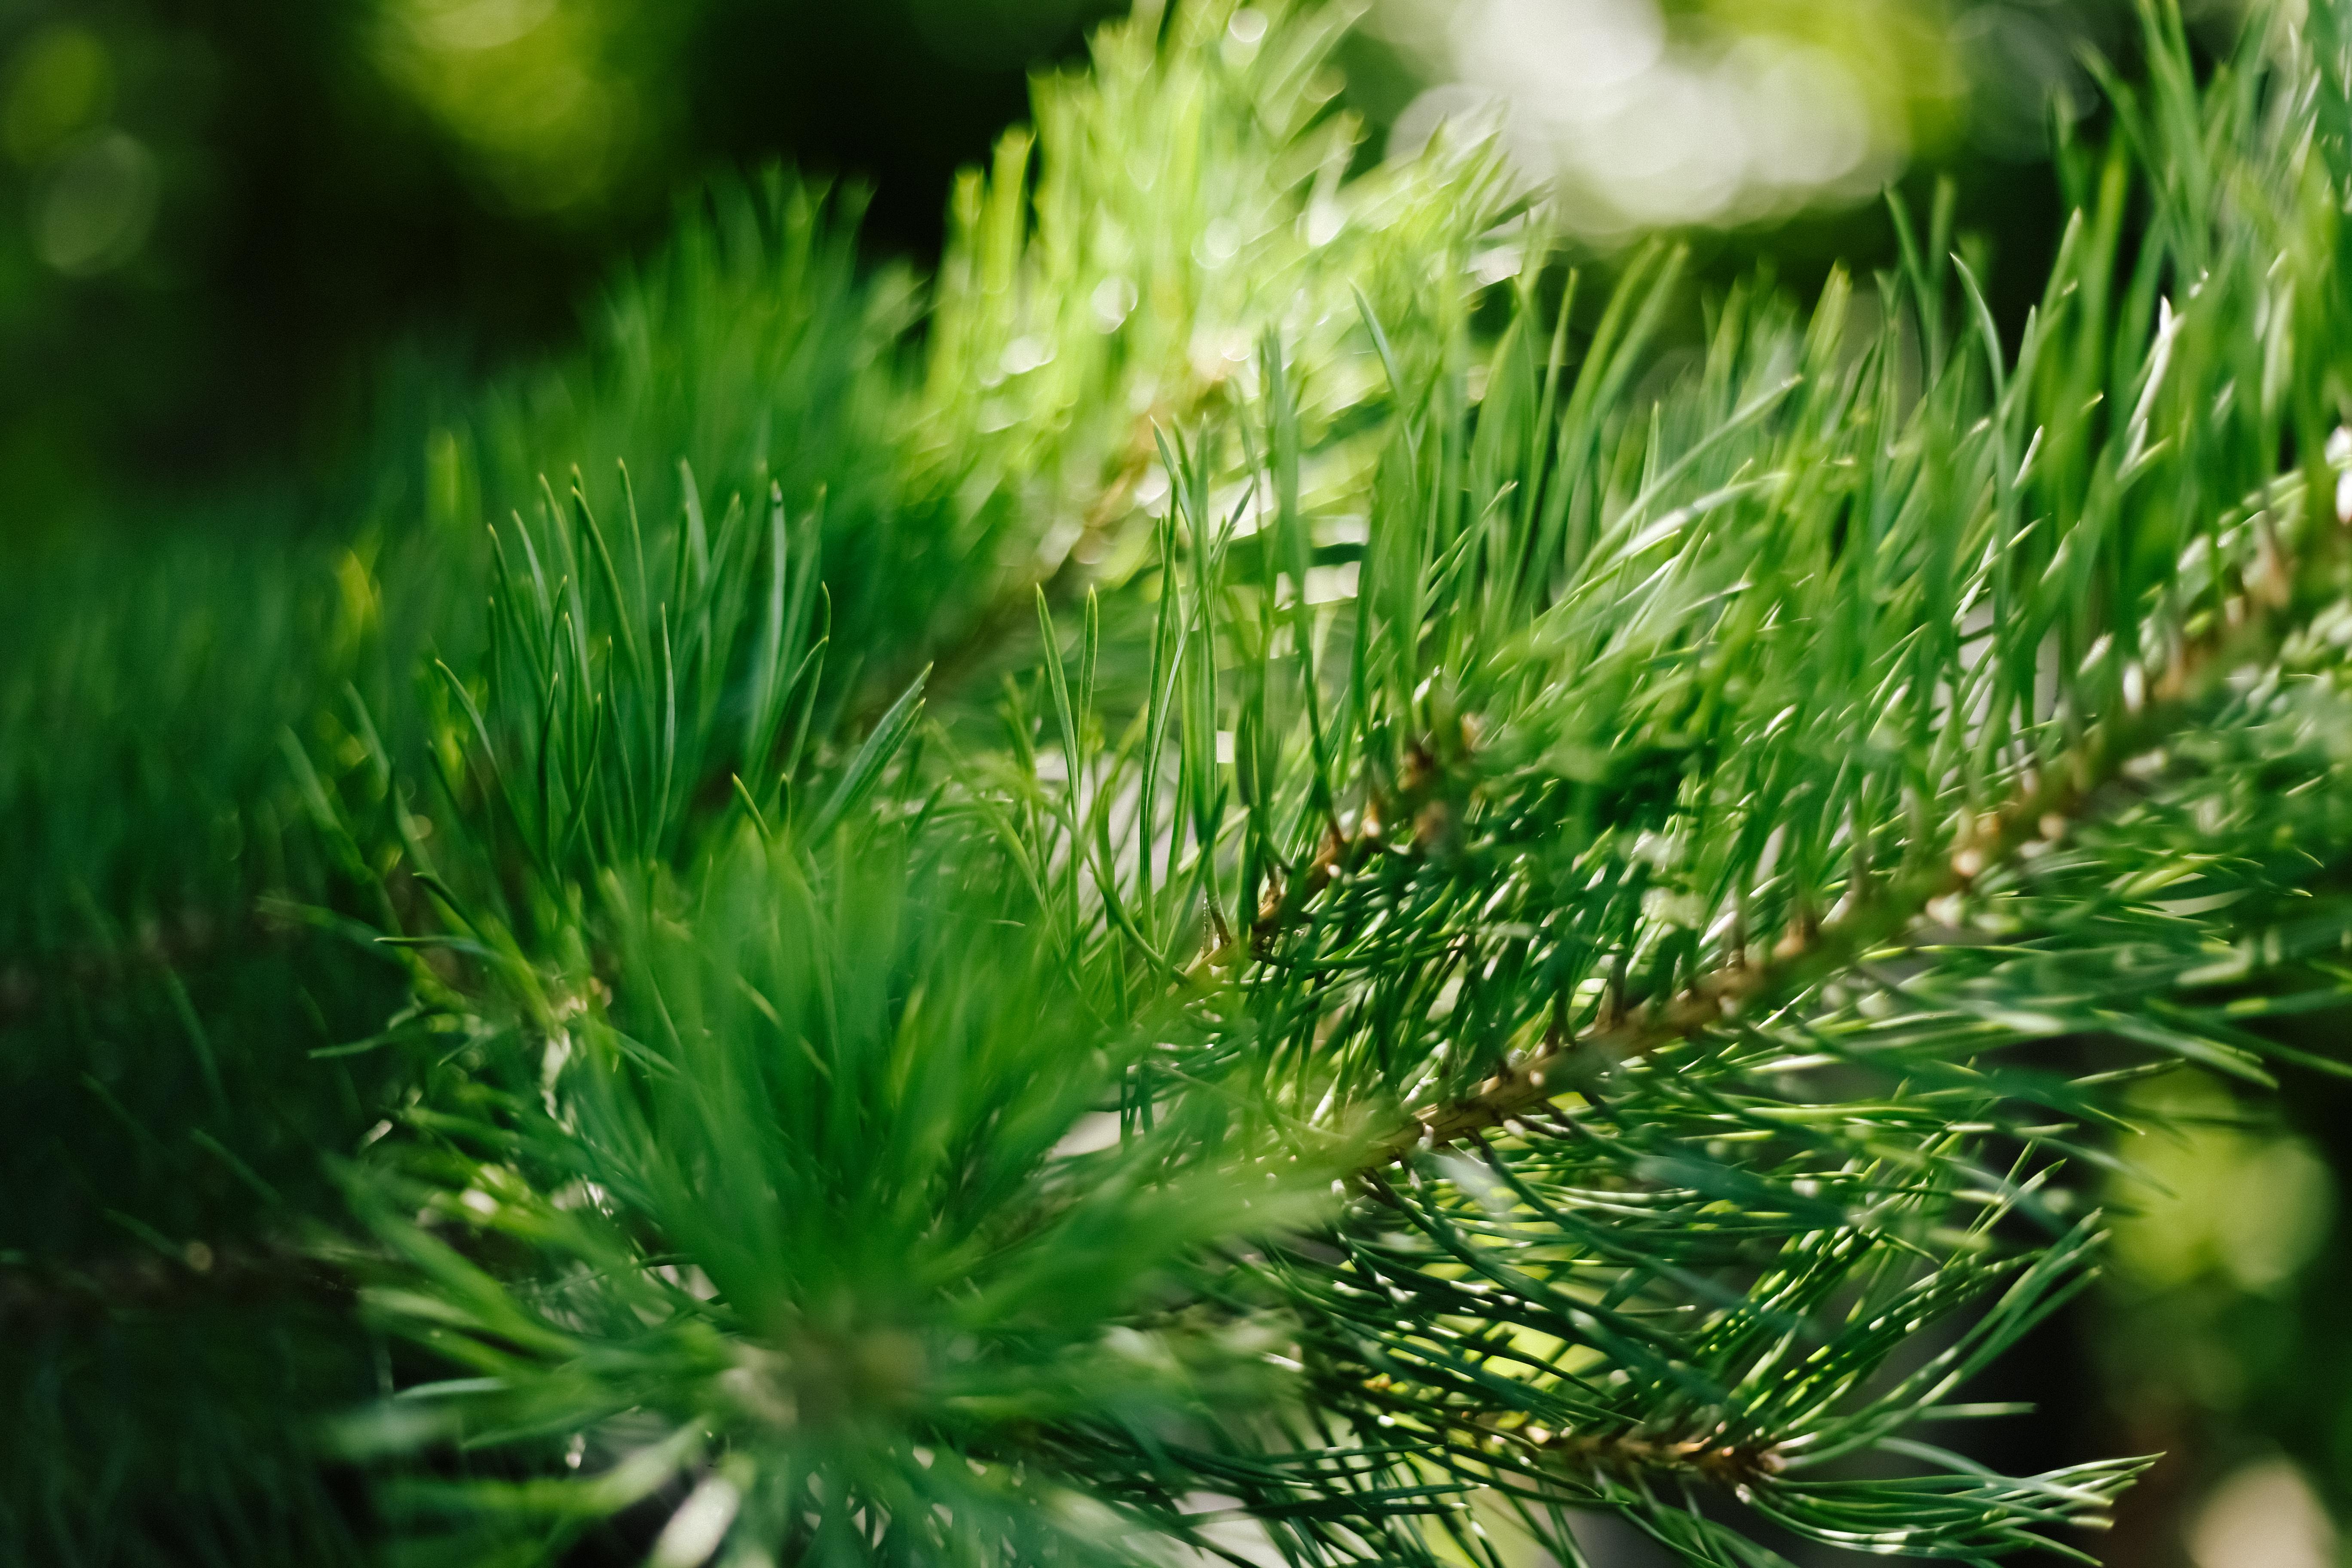 closeup-photo-of-green-needle-pine-tree-blurred-pine-needles-in-background.jpg